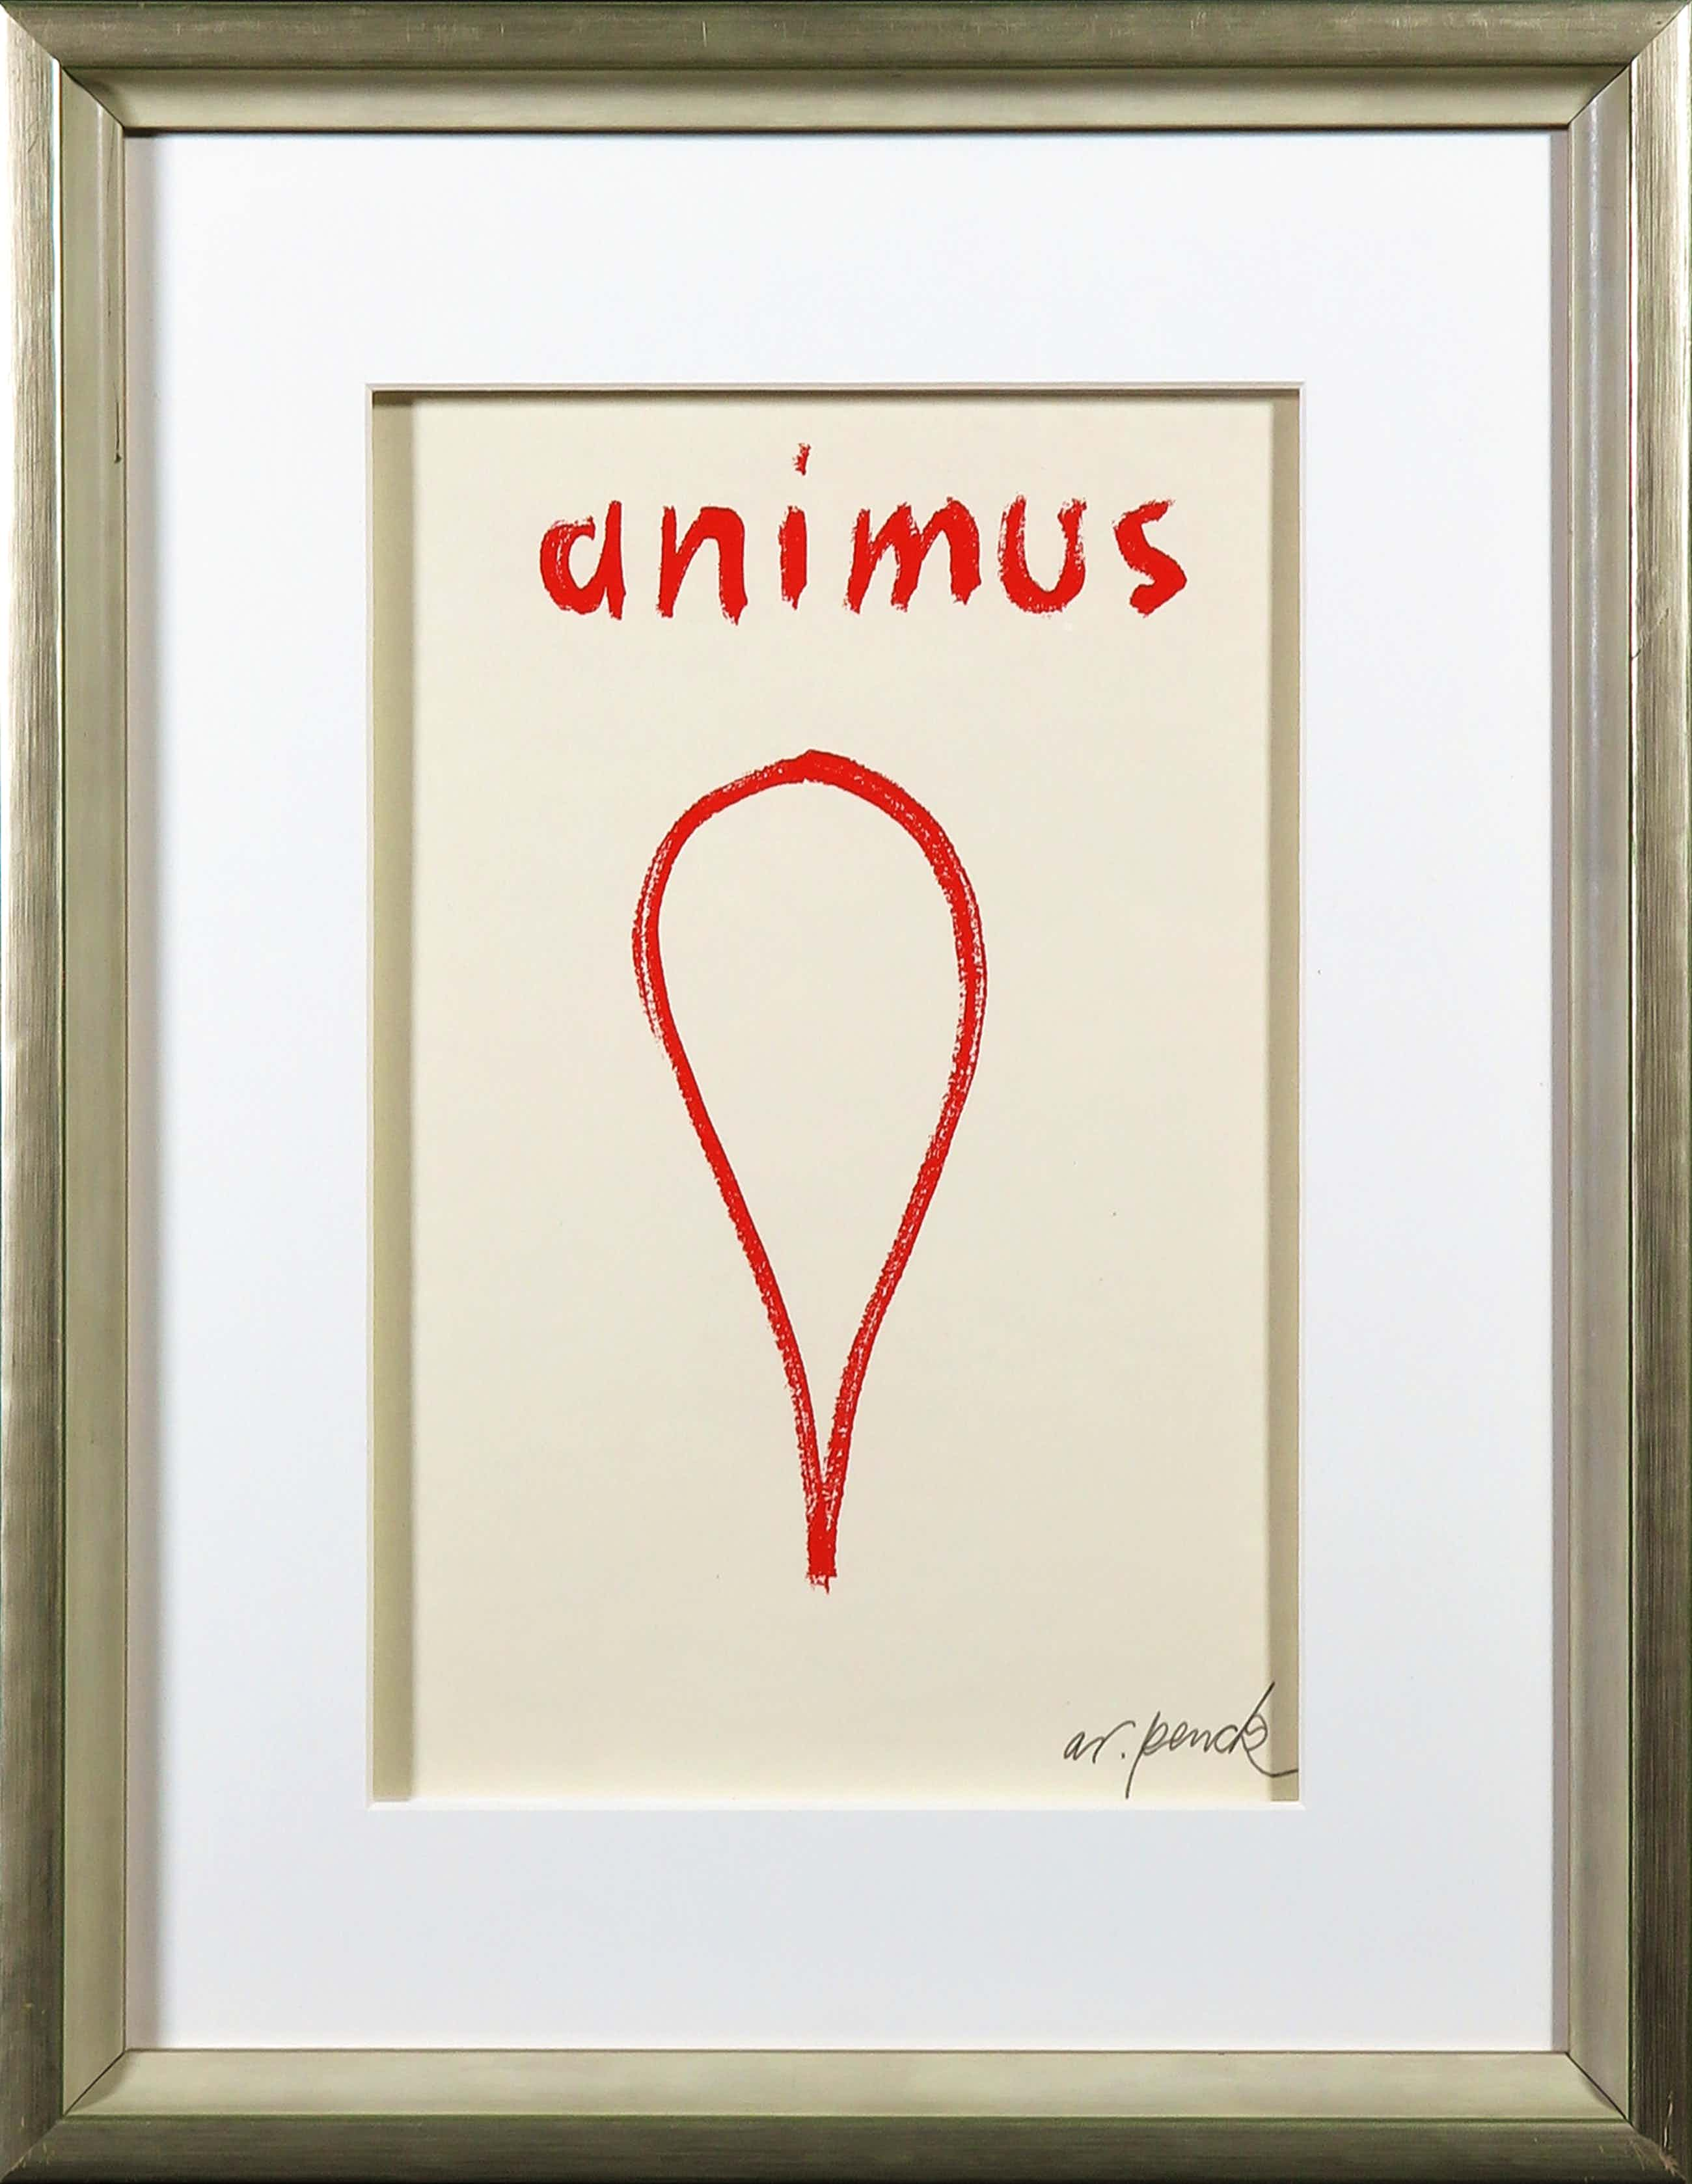 A.R. Penck - Zeldzame, handgesigneerde litho, Animus kopen? Bied vanaf 150!